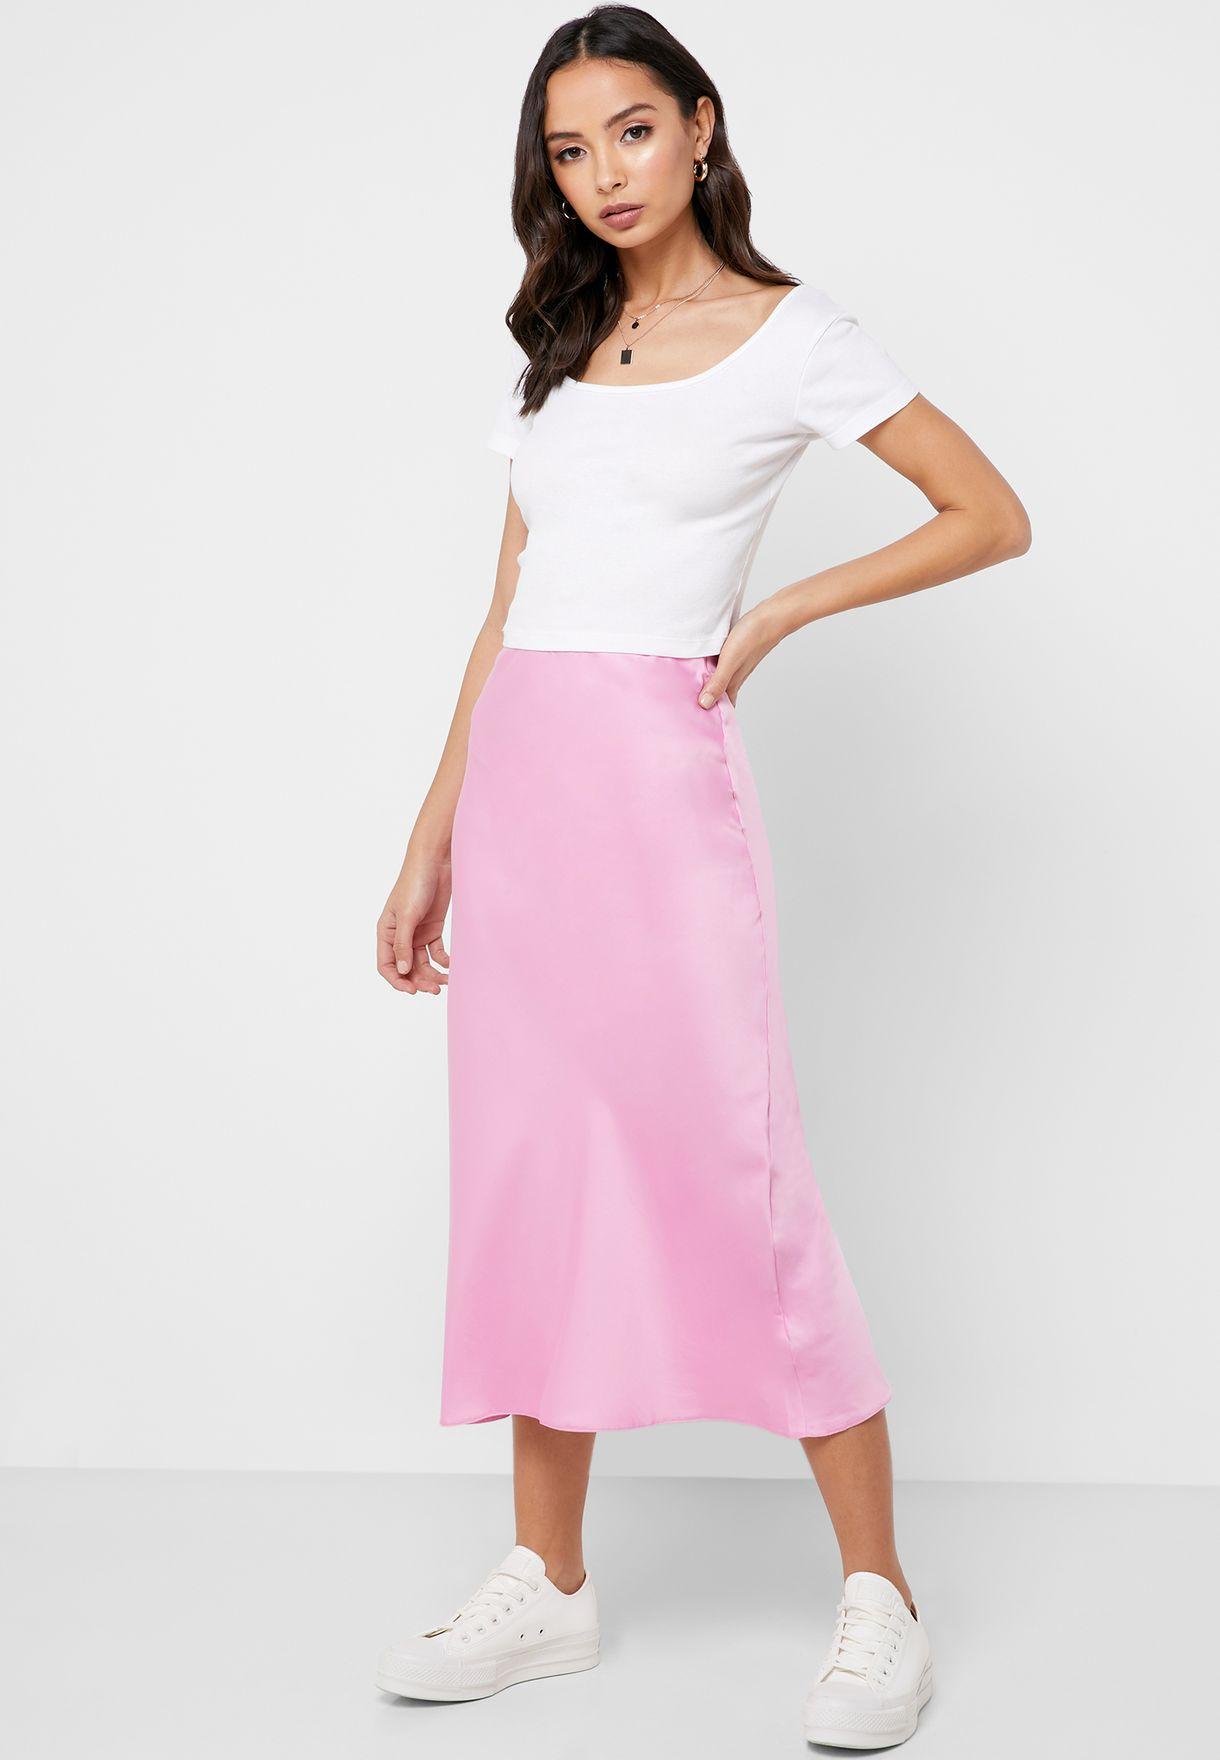 ec01fba0569b1 Shop Miss Selfridge pink Bias Cut Satin Slip Skirt 15L31XPNK for ...